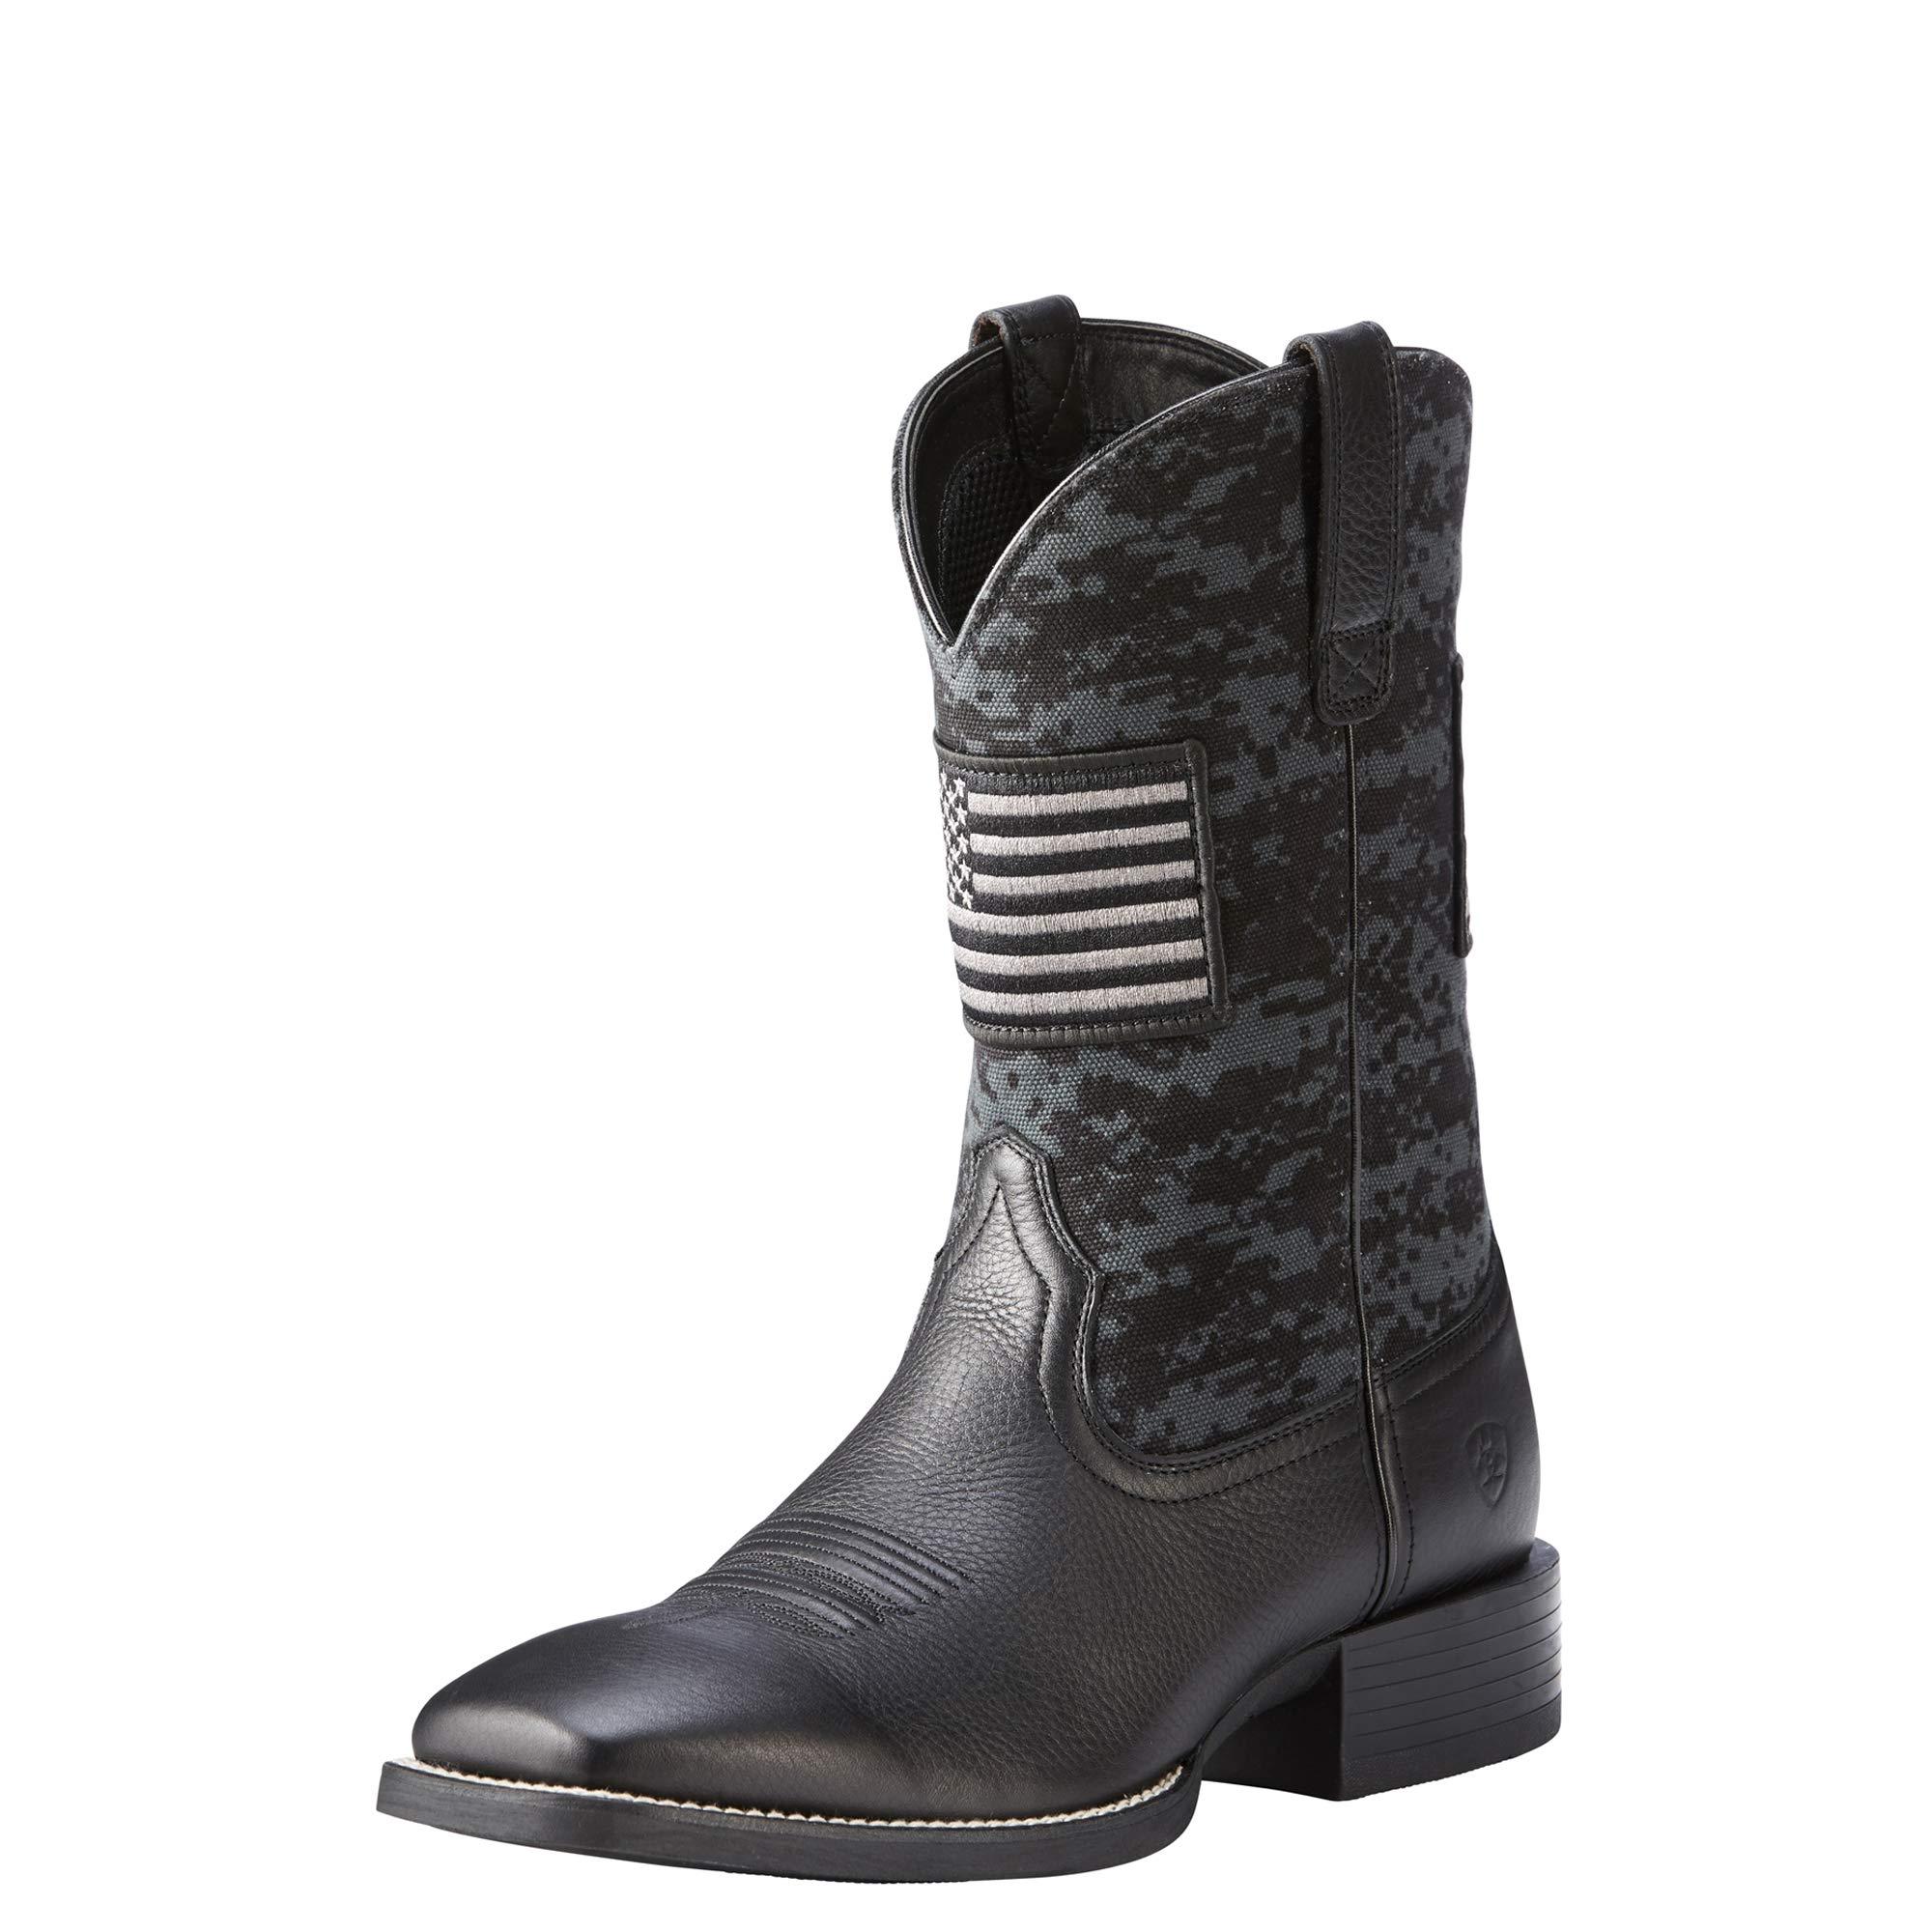 Ariat Men's Sport Patriot Western Boot, Deer tan/Black camo Print, 10 D US by ARIAT